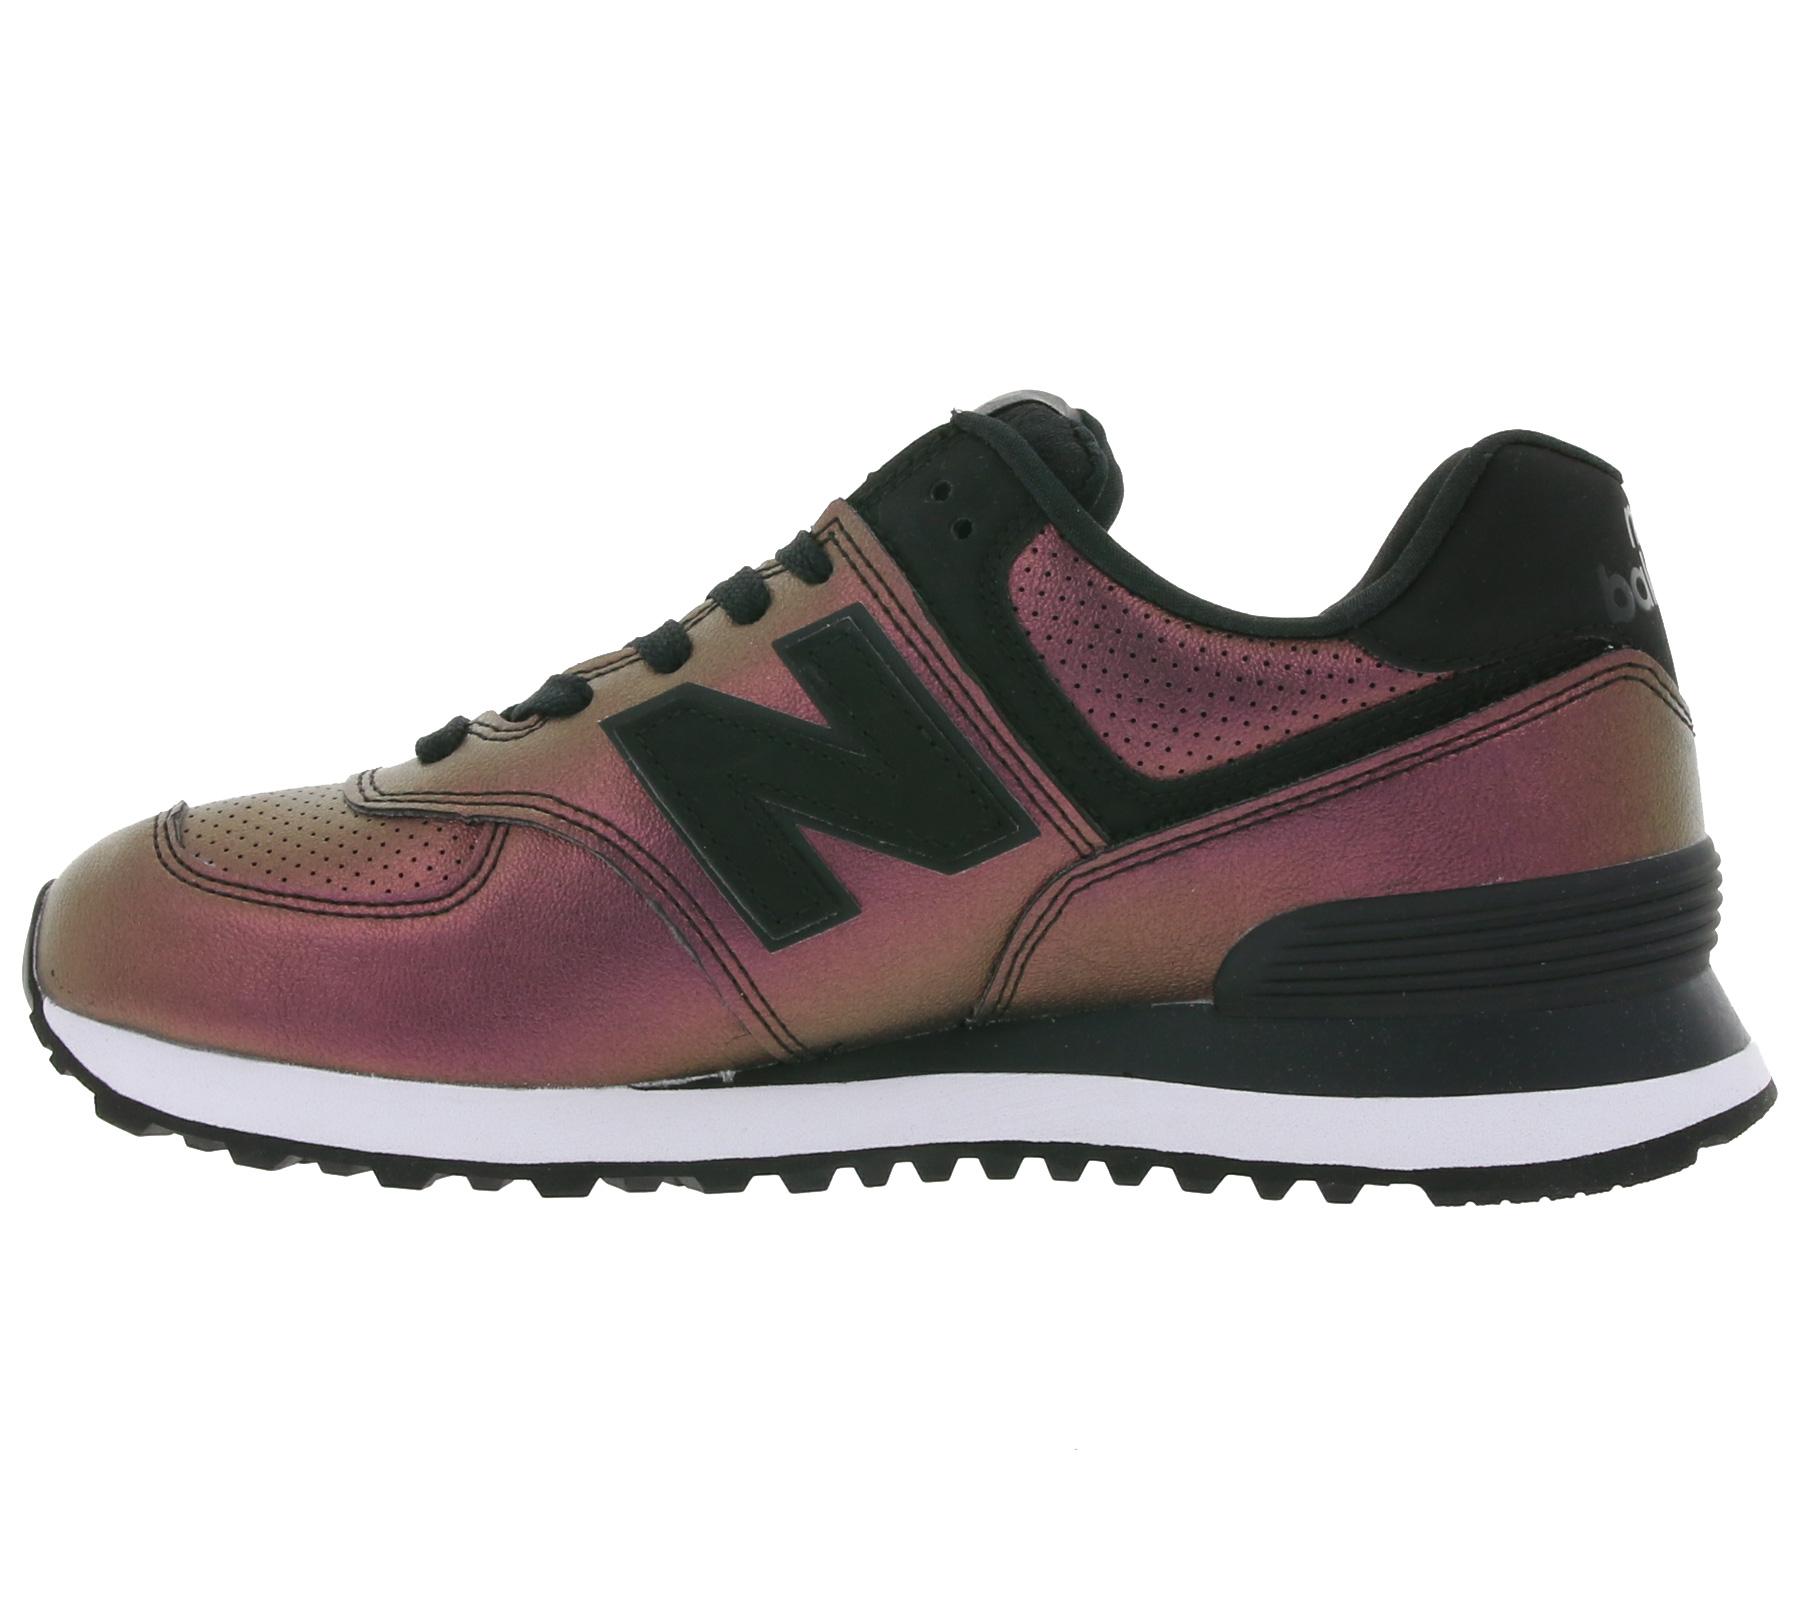 1685202c7e32e6 New Balance Schuhe   Sneaker im Sale Online-Shop   Outlet